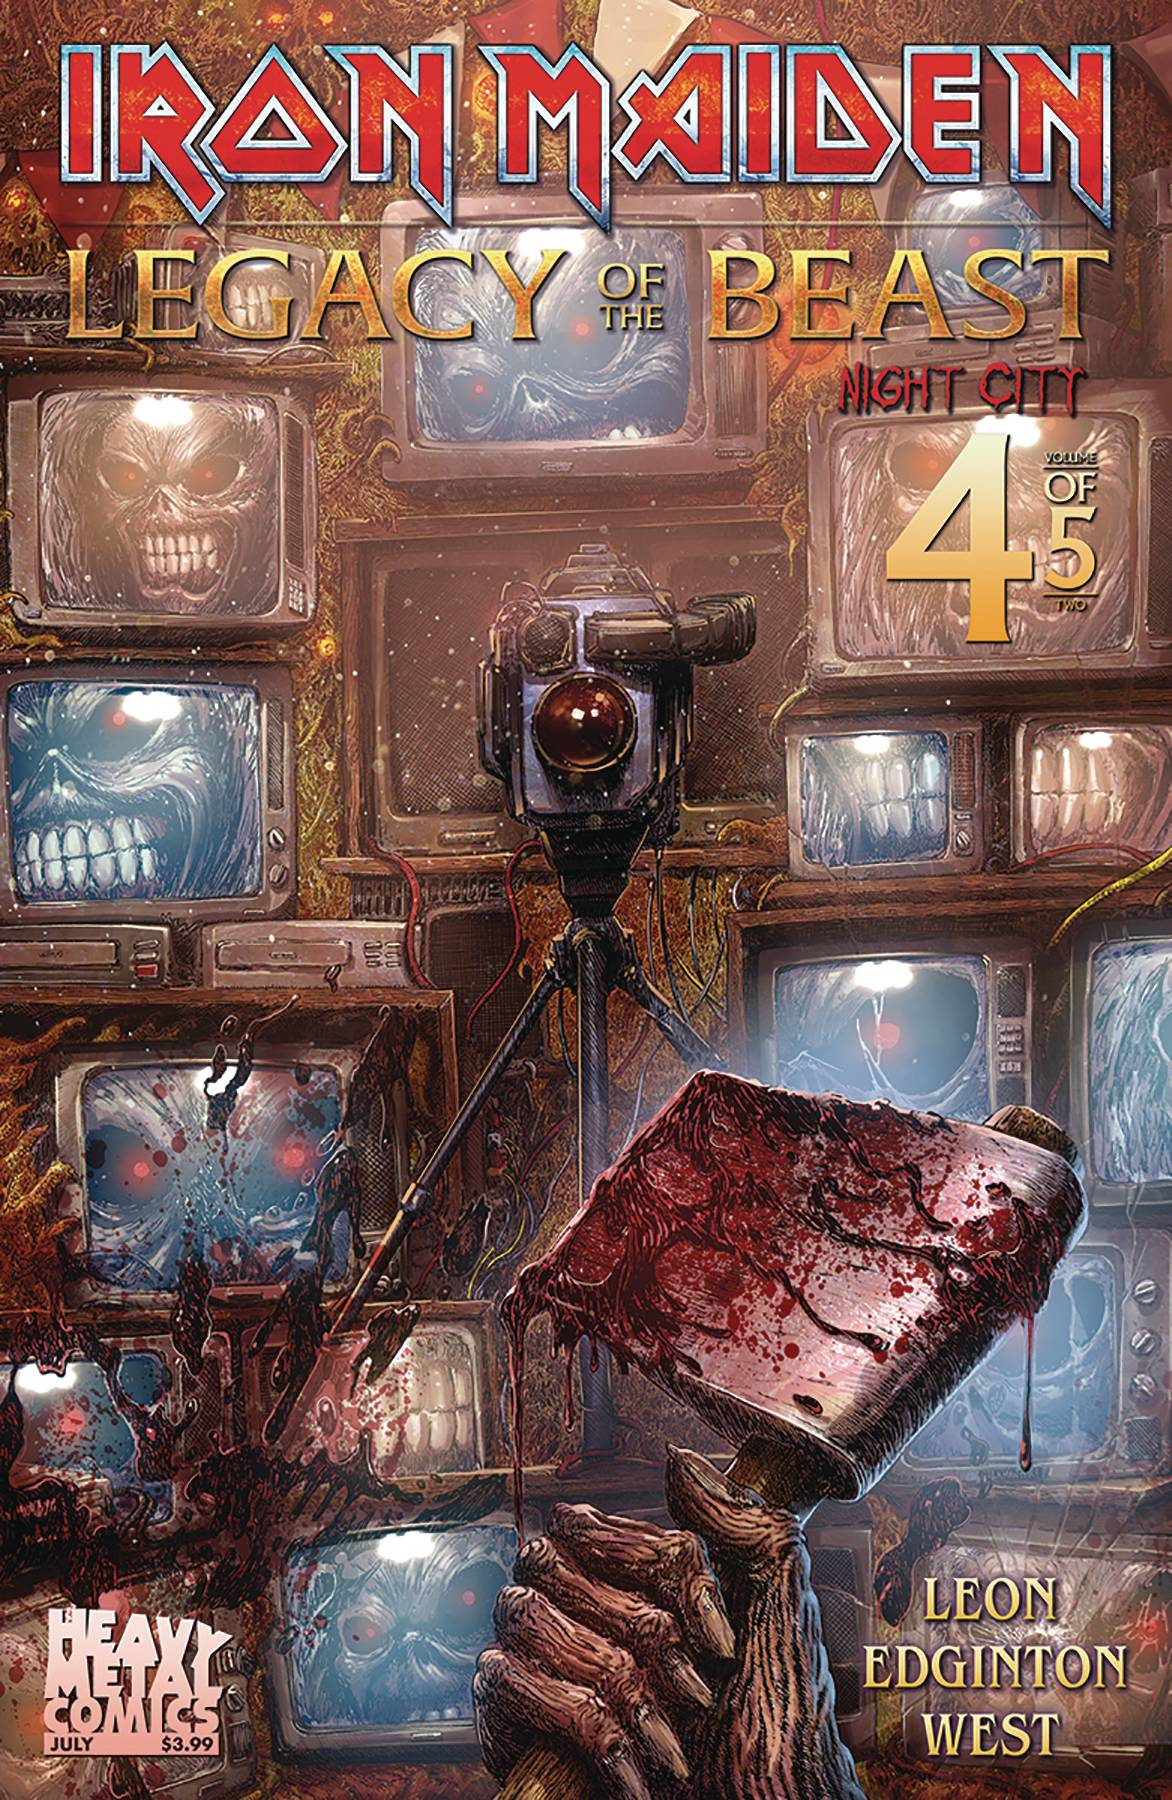 Iron Maiden: Legacy of the Beast Vol 2 - Night City #4 (2020)